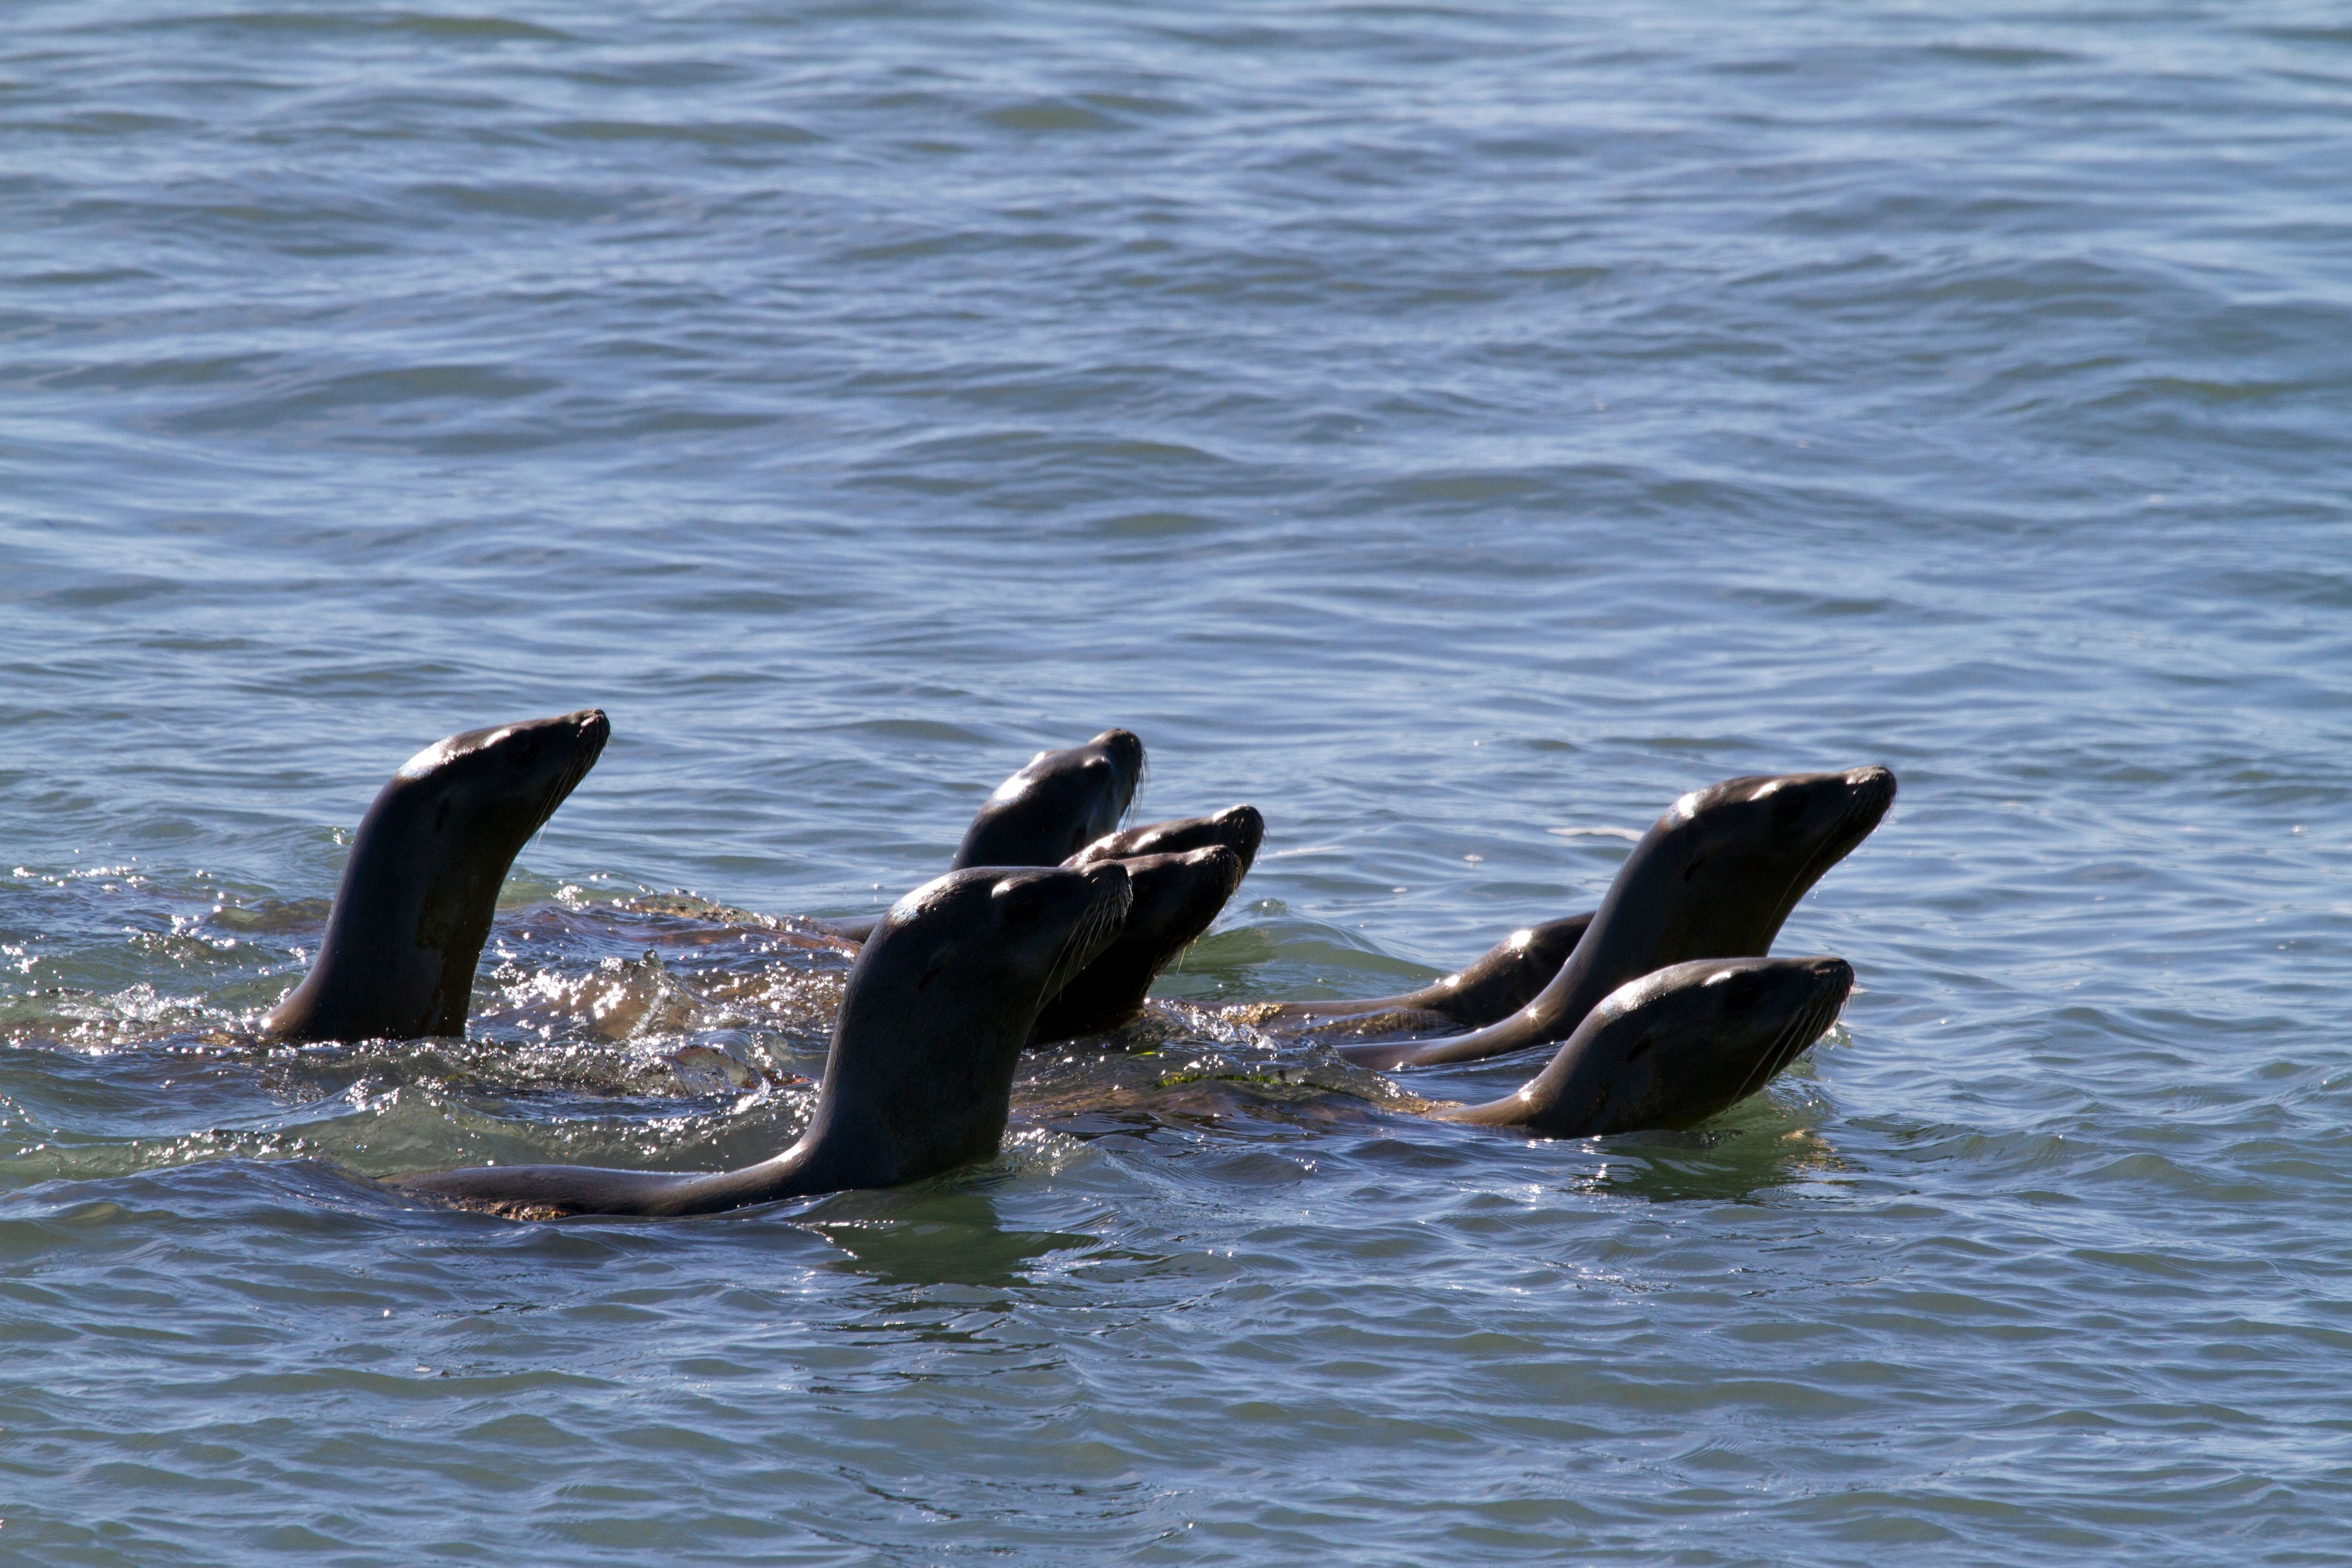 Sealions Swimming